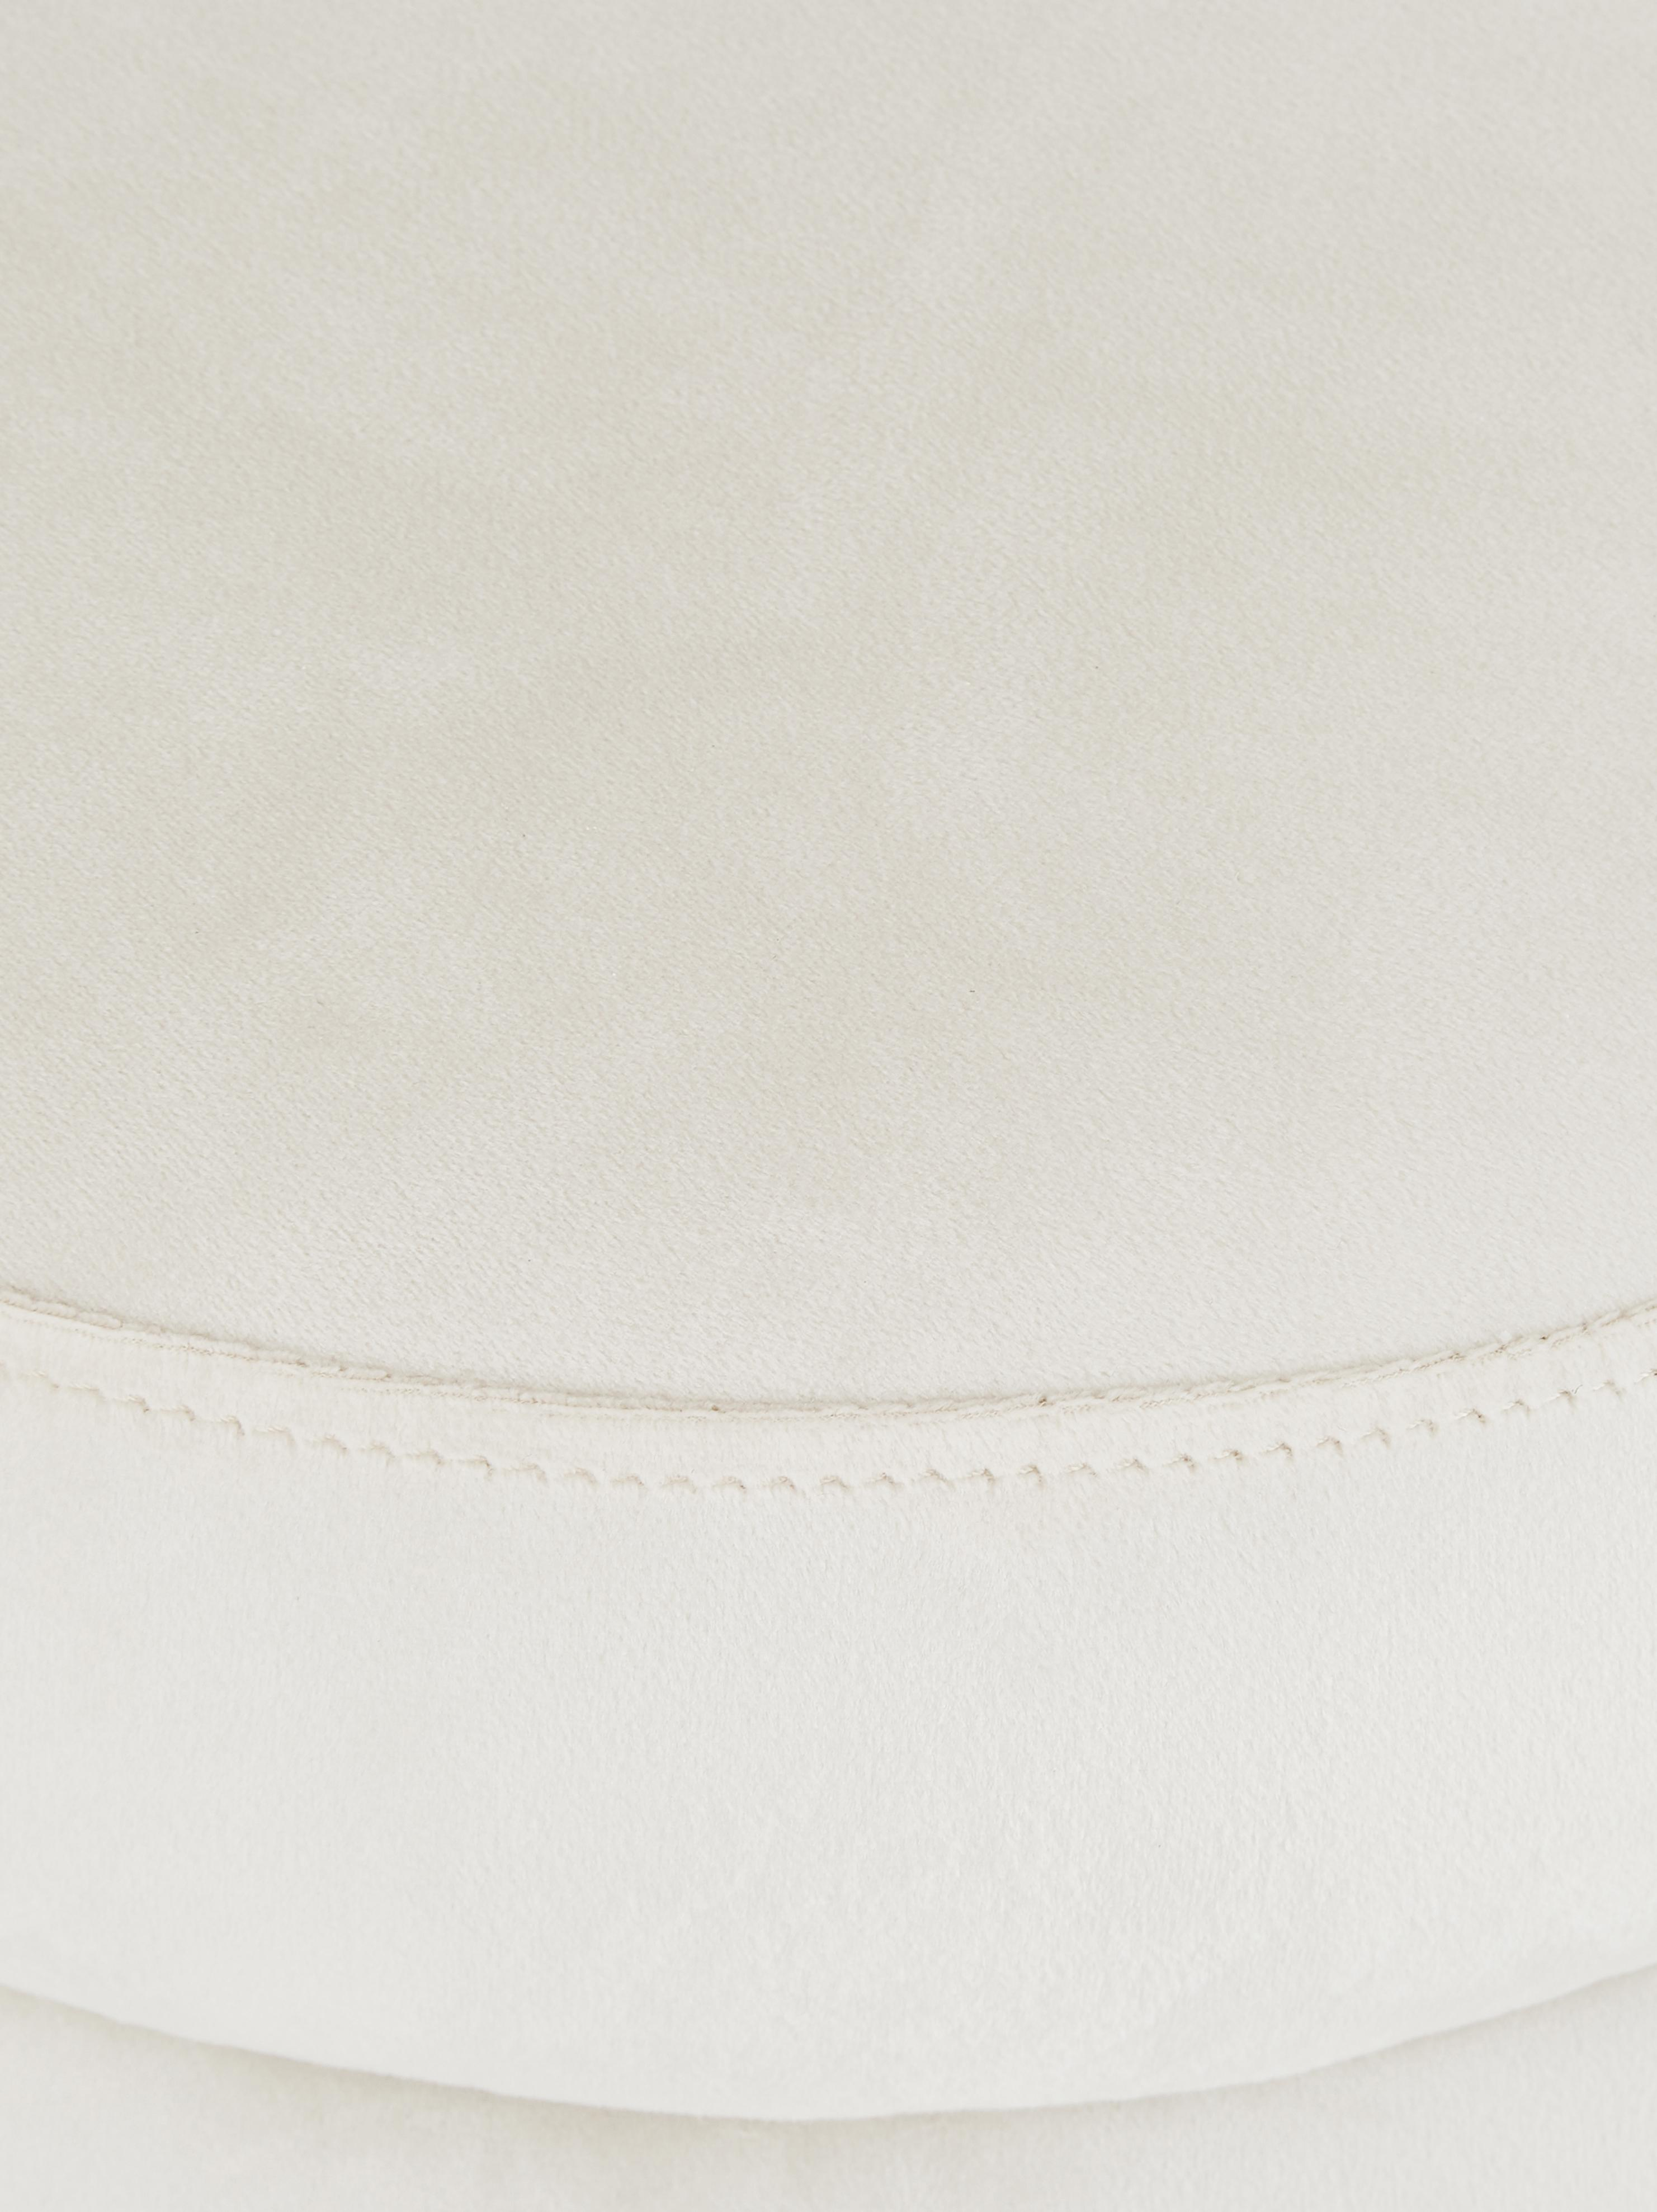 Samt-Hocker Alto, Bezug: Samt (Polyester) 30.000 S, Gestell: Massives Kiefernholz, Spe, Samt Cremeweiß, Ø 42 x H 47 cm